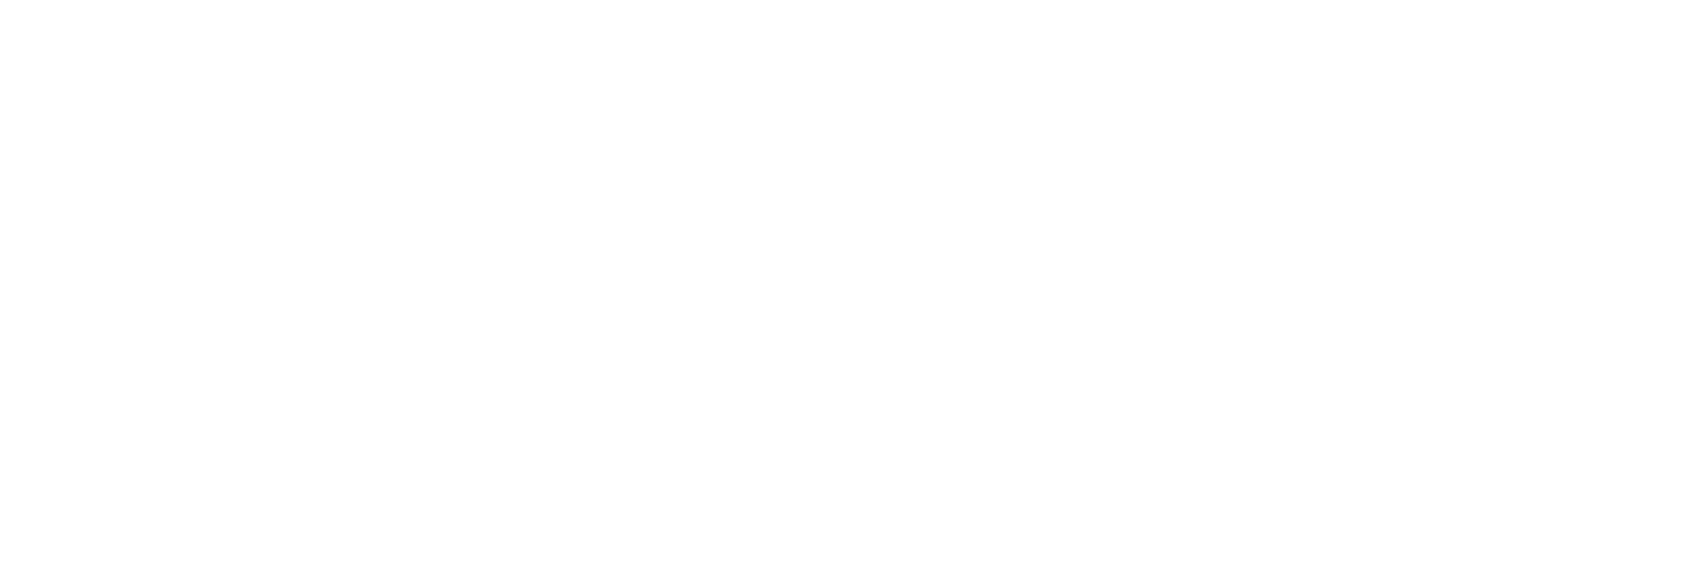 Canadian Constitution Foundation